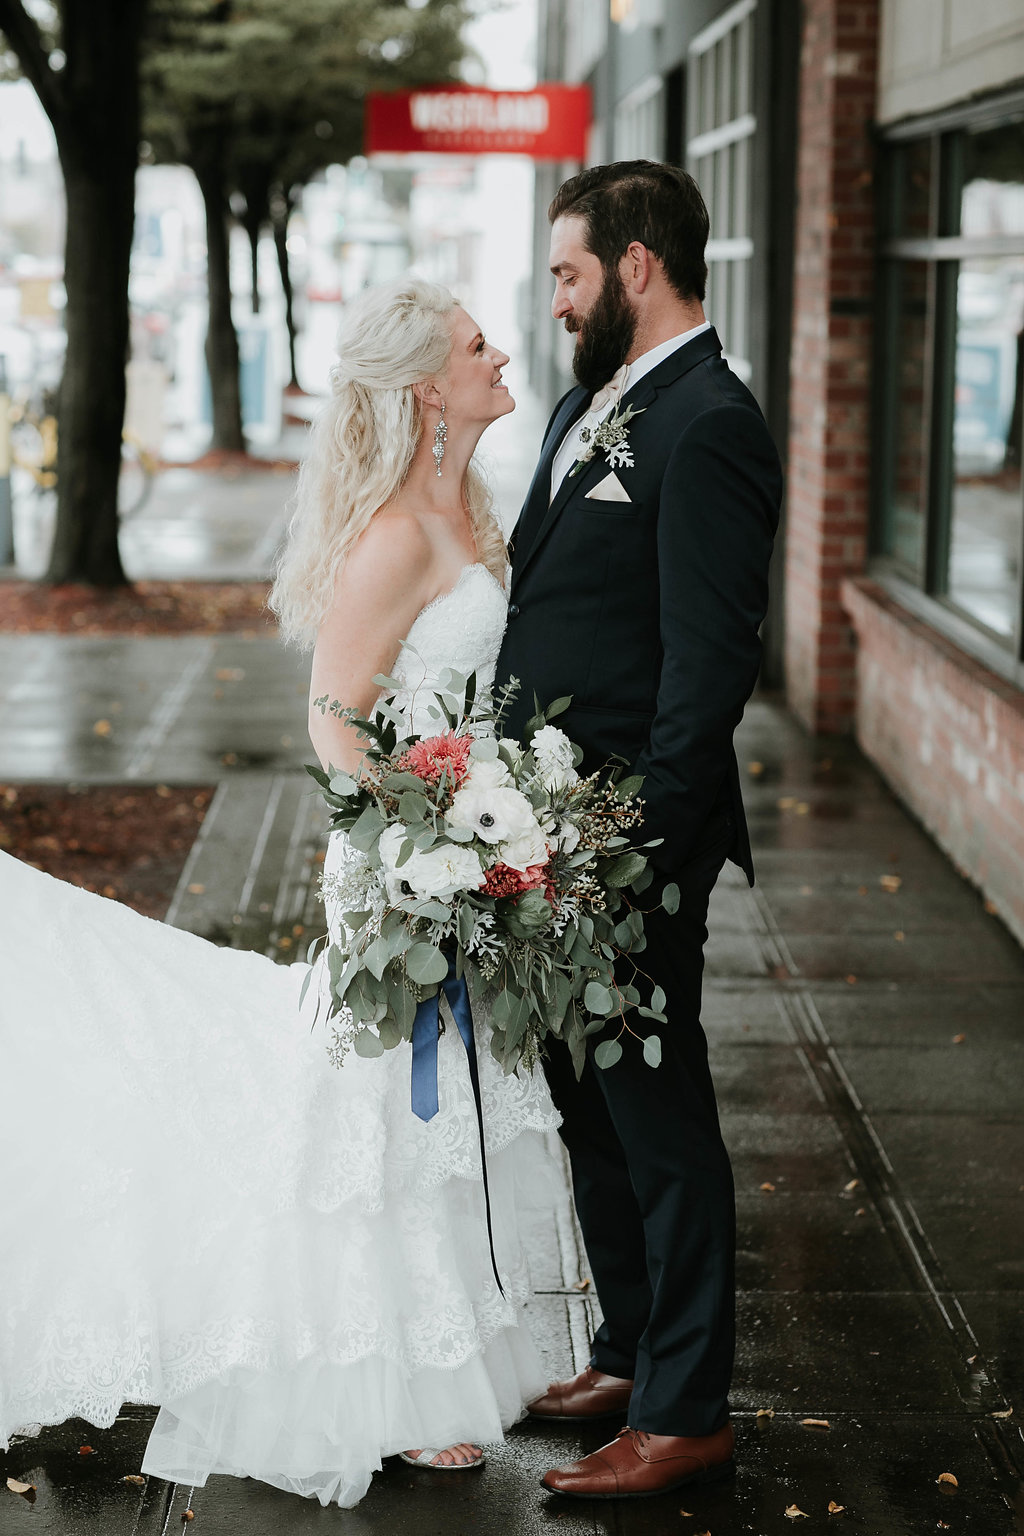 The_Big_Fake_wedding_Seattle_Within_sodo_wedding_by_Adina_Preston_Weddings_99.JPG